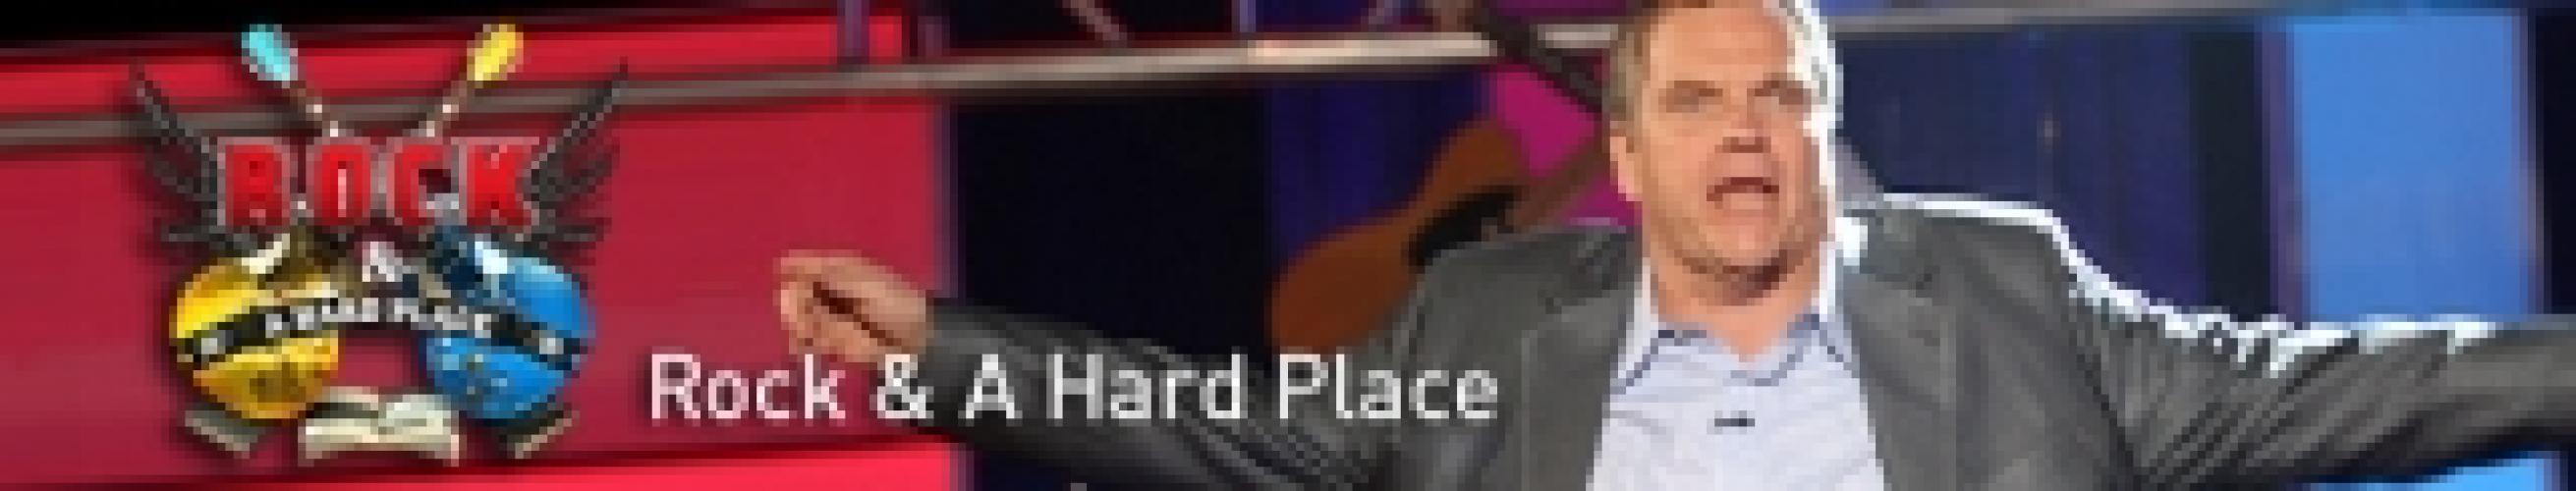 Rock & A Hard Place next episode air date poster